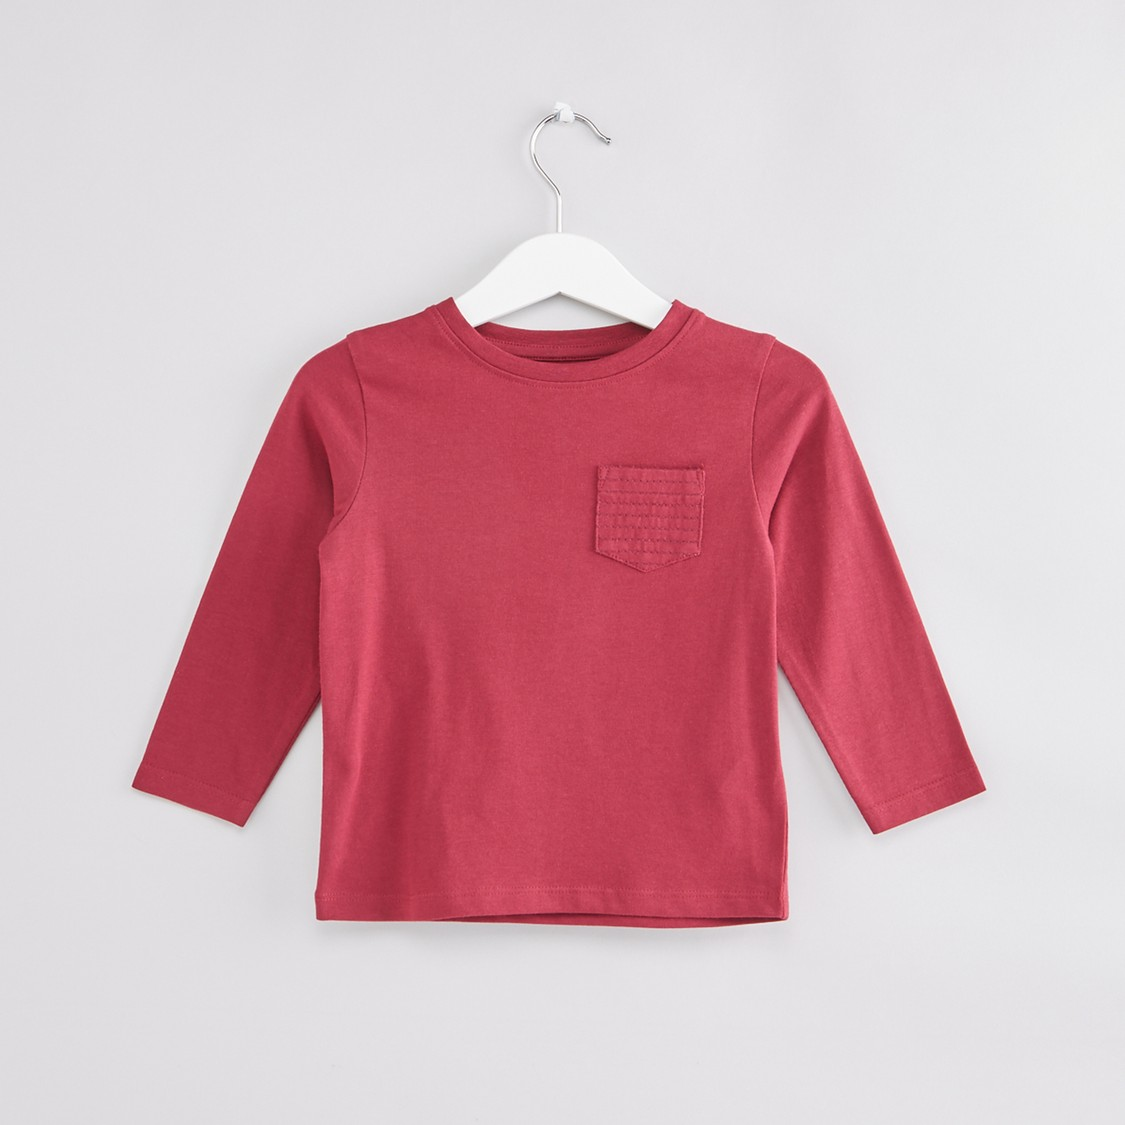 Pocket Detail Round Neck Long Sleeves T-Shirt